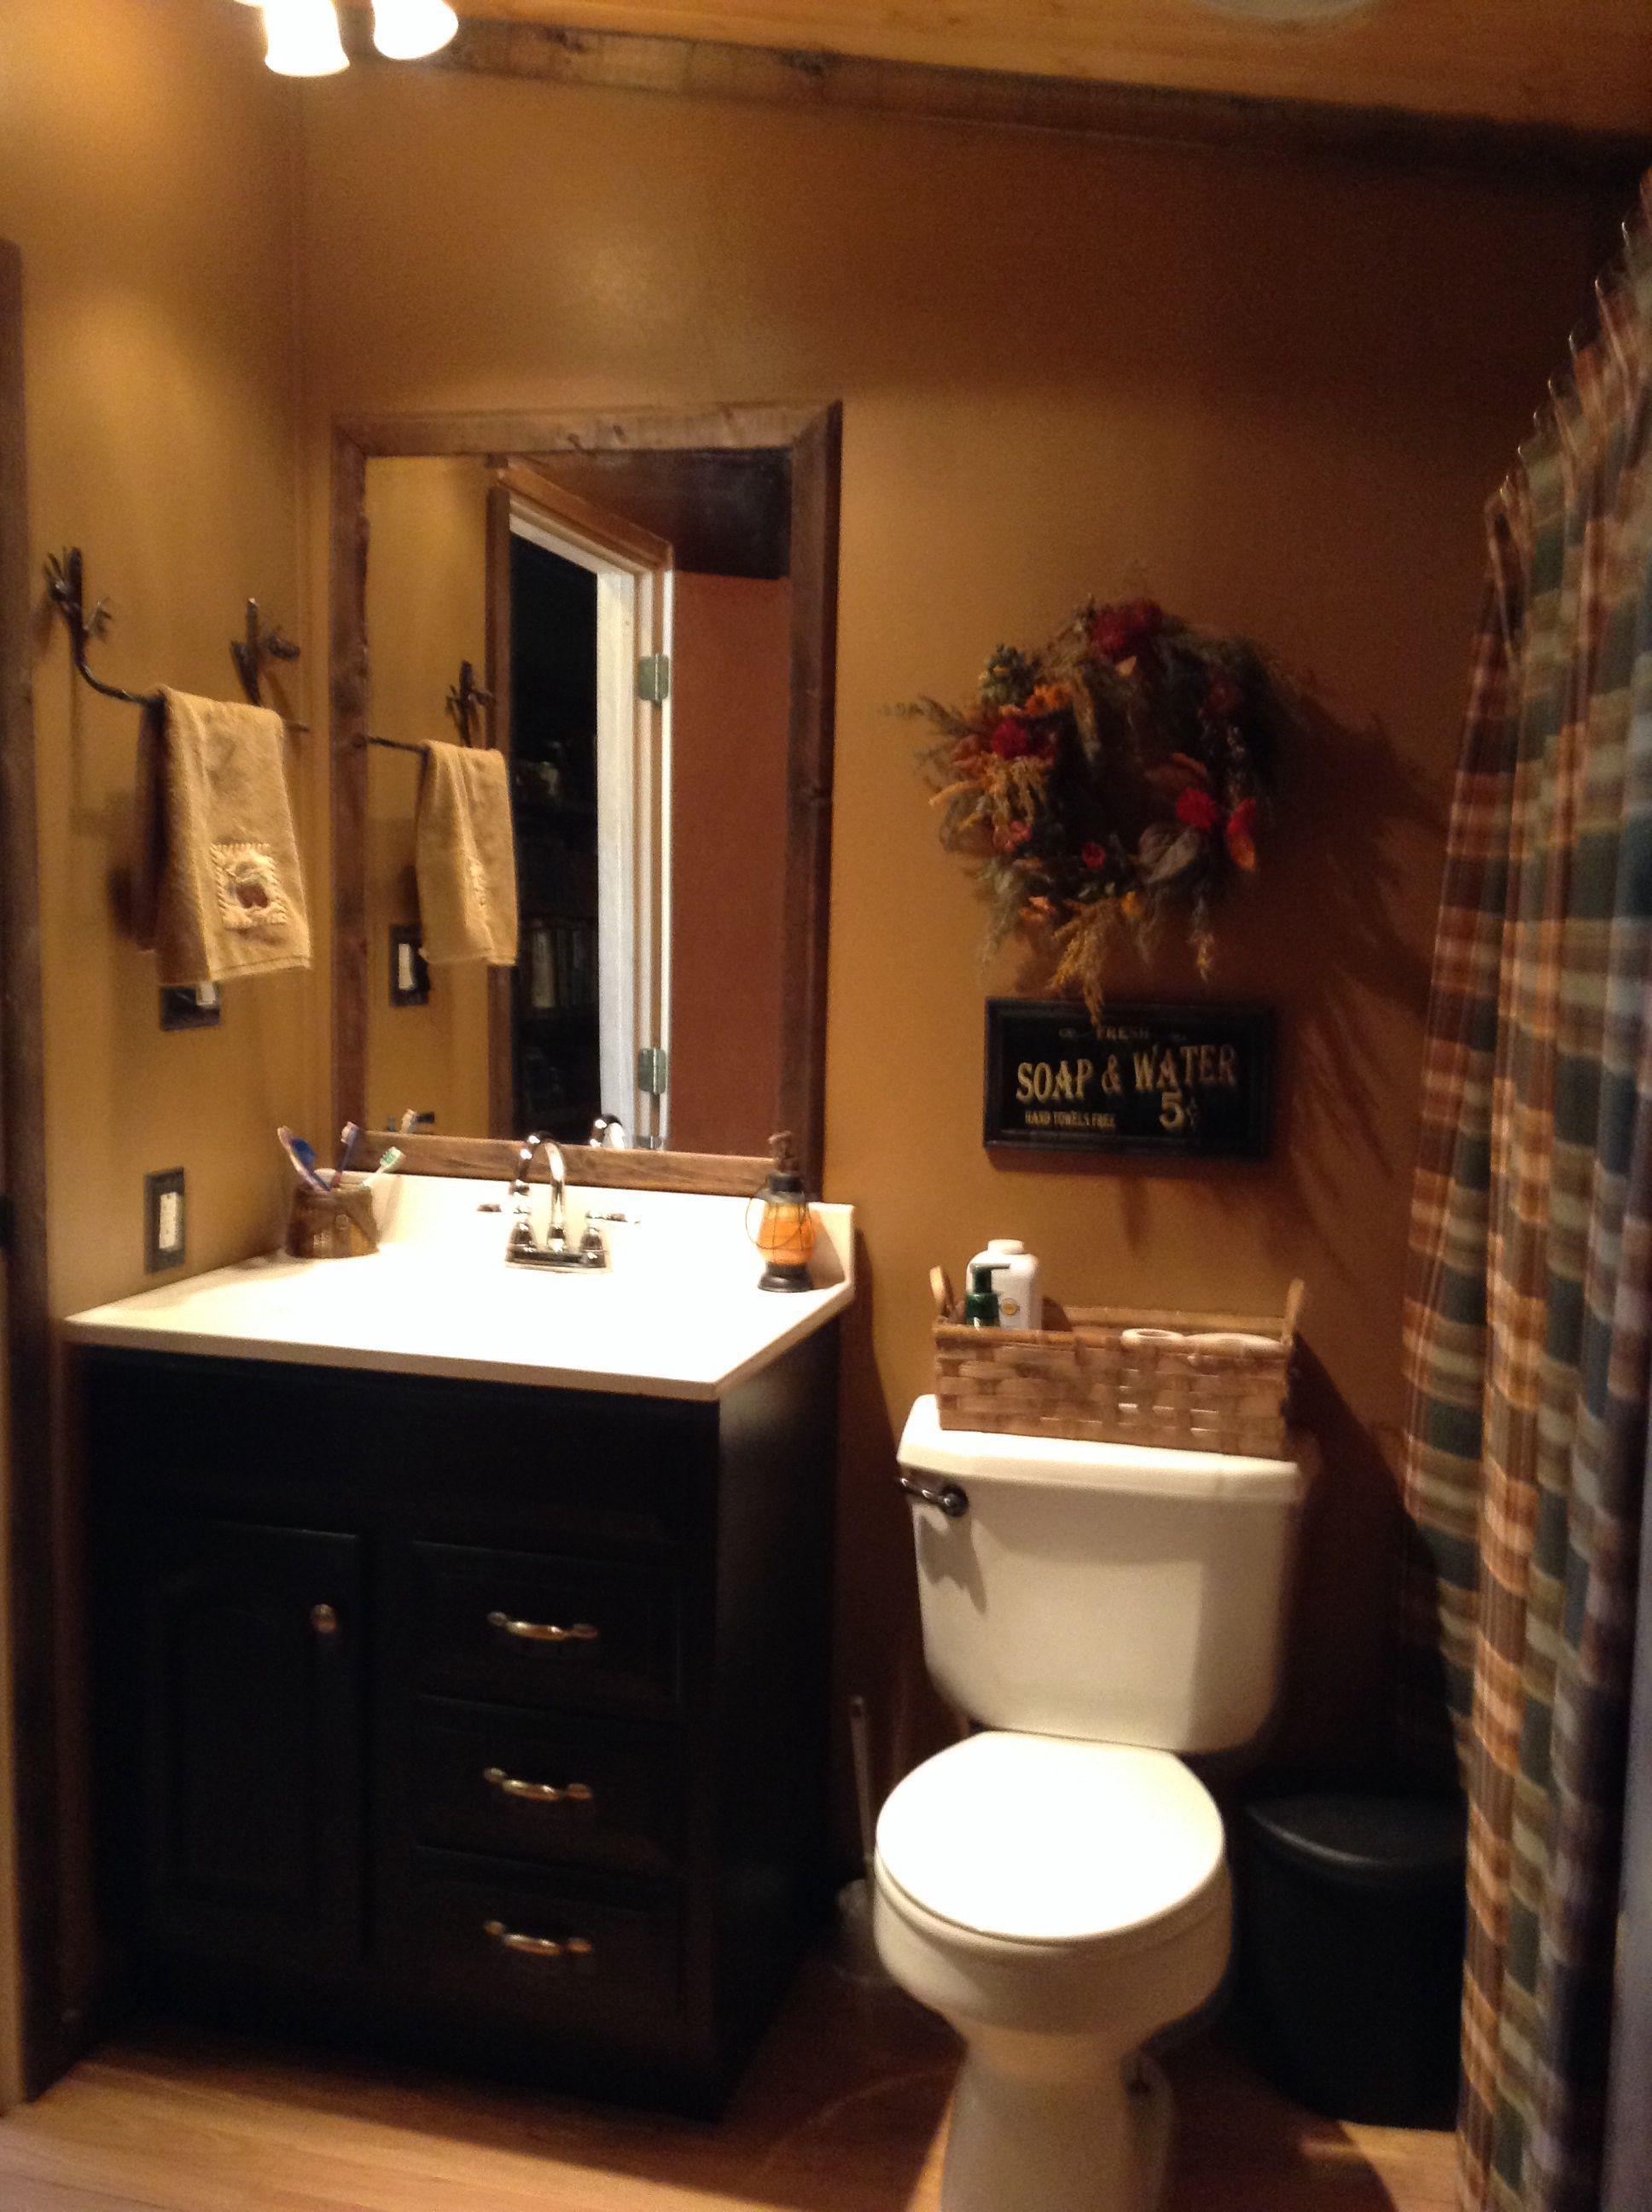 A New Old 18th Century Home Rue Trendy Bathroom Bathroom Inspiration Bathroom Colors